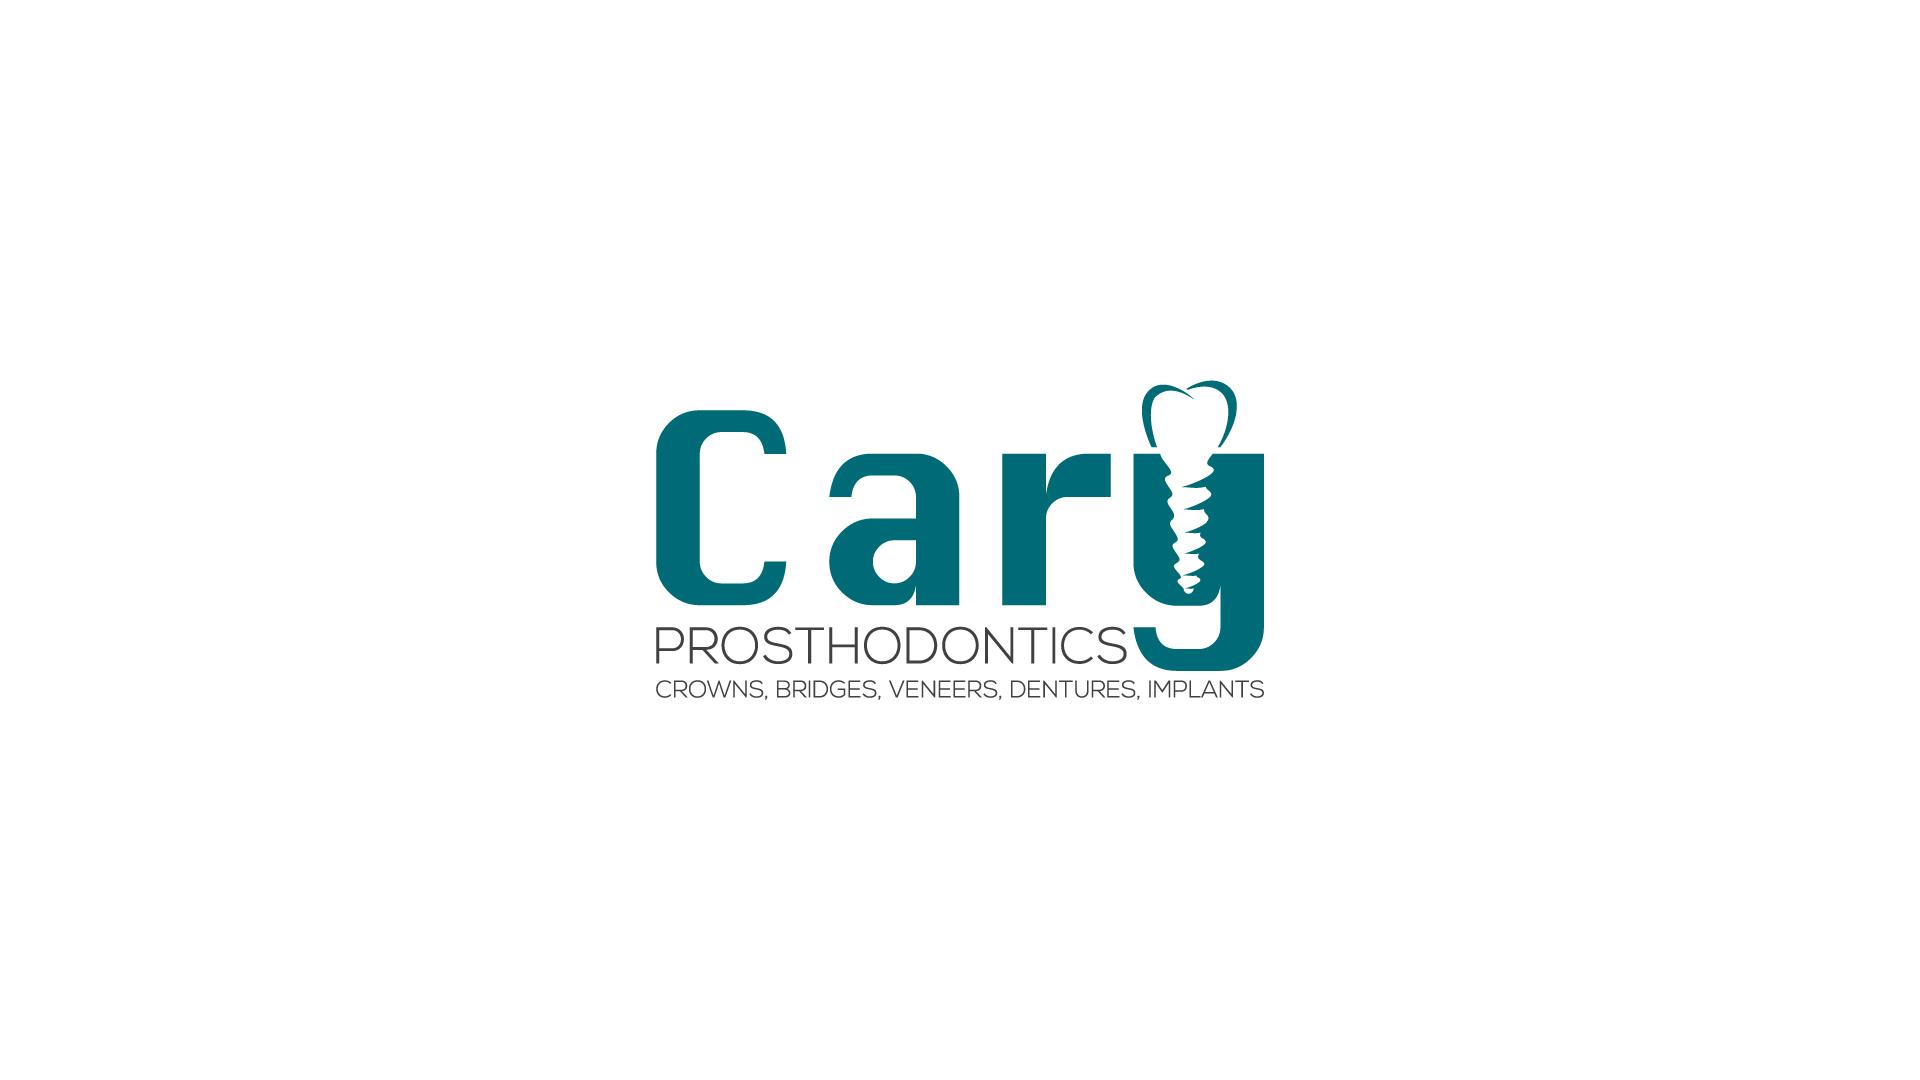 Logo Design by MD SHOHIDUL ISLAM - Entry No. 88 in the Logo Design Contest Cary Prosthodontics Logo Design.